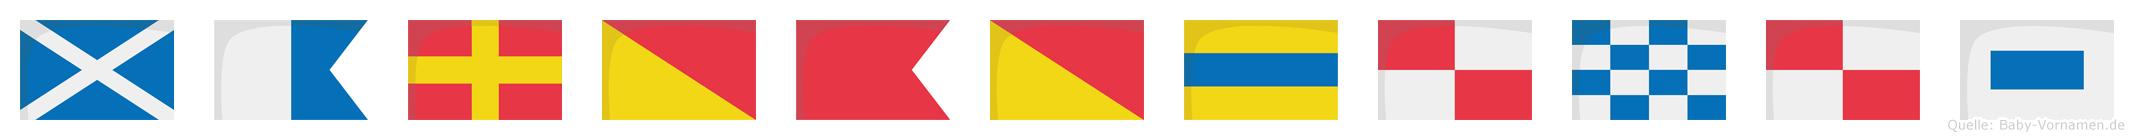 Marobodunus im Flaggenalphabet